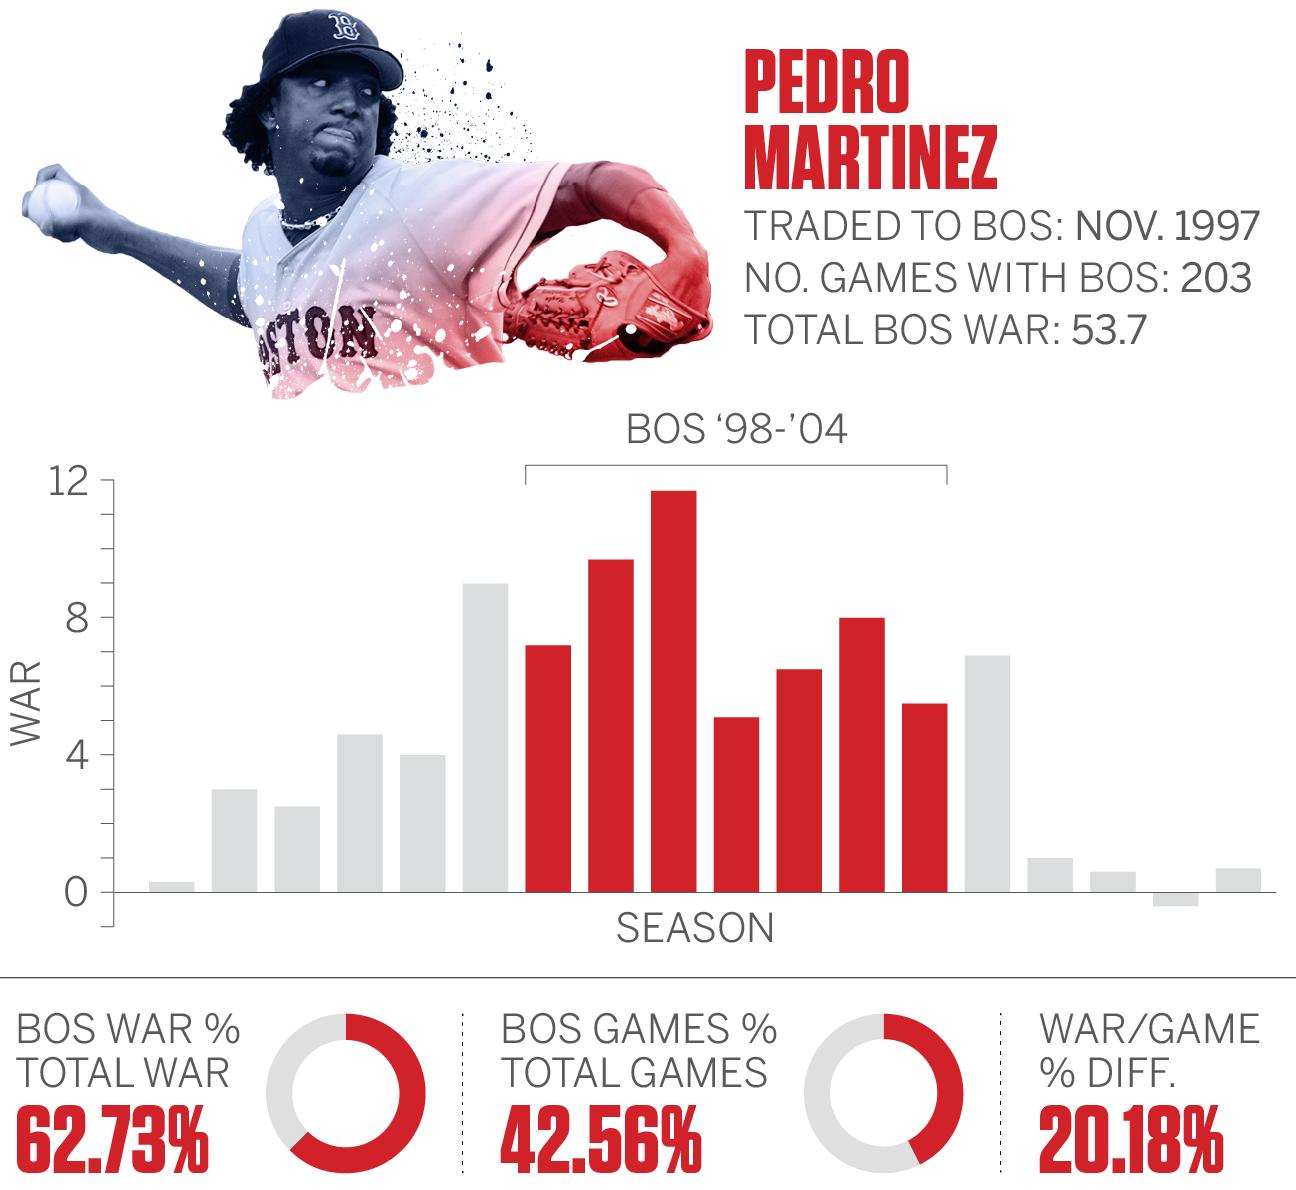 Yankees topple Red Sox in 16 innings